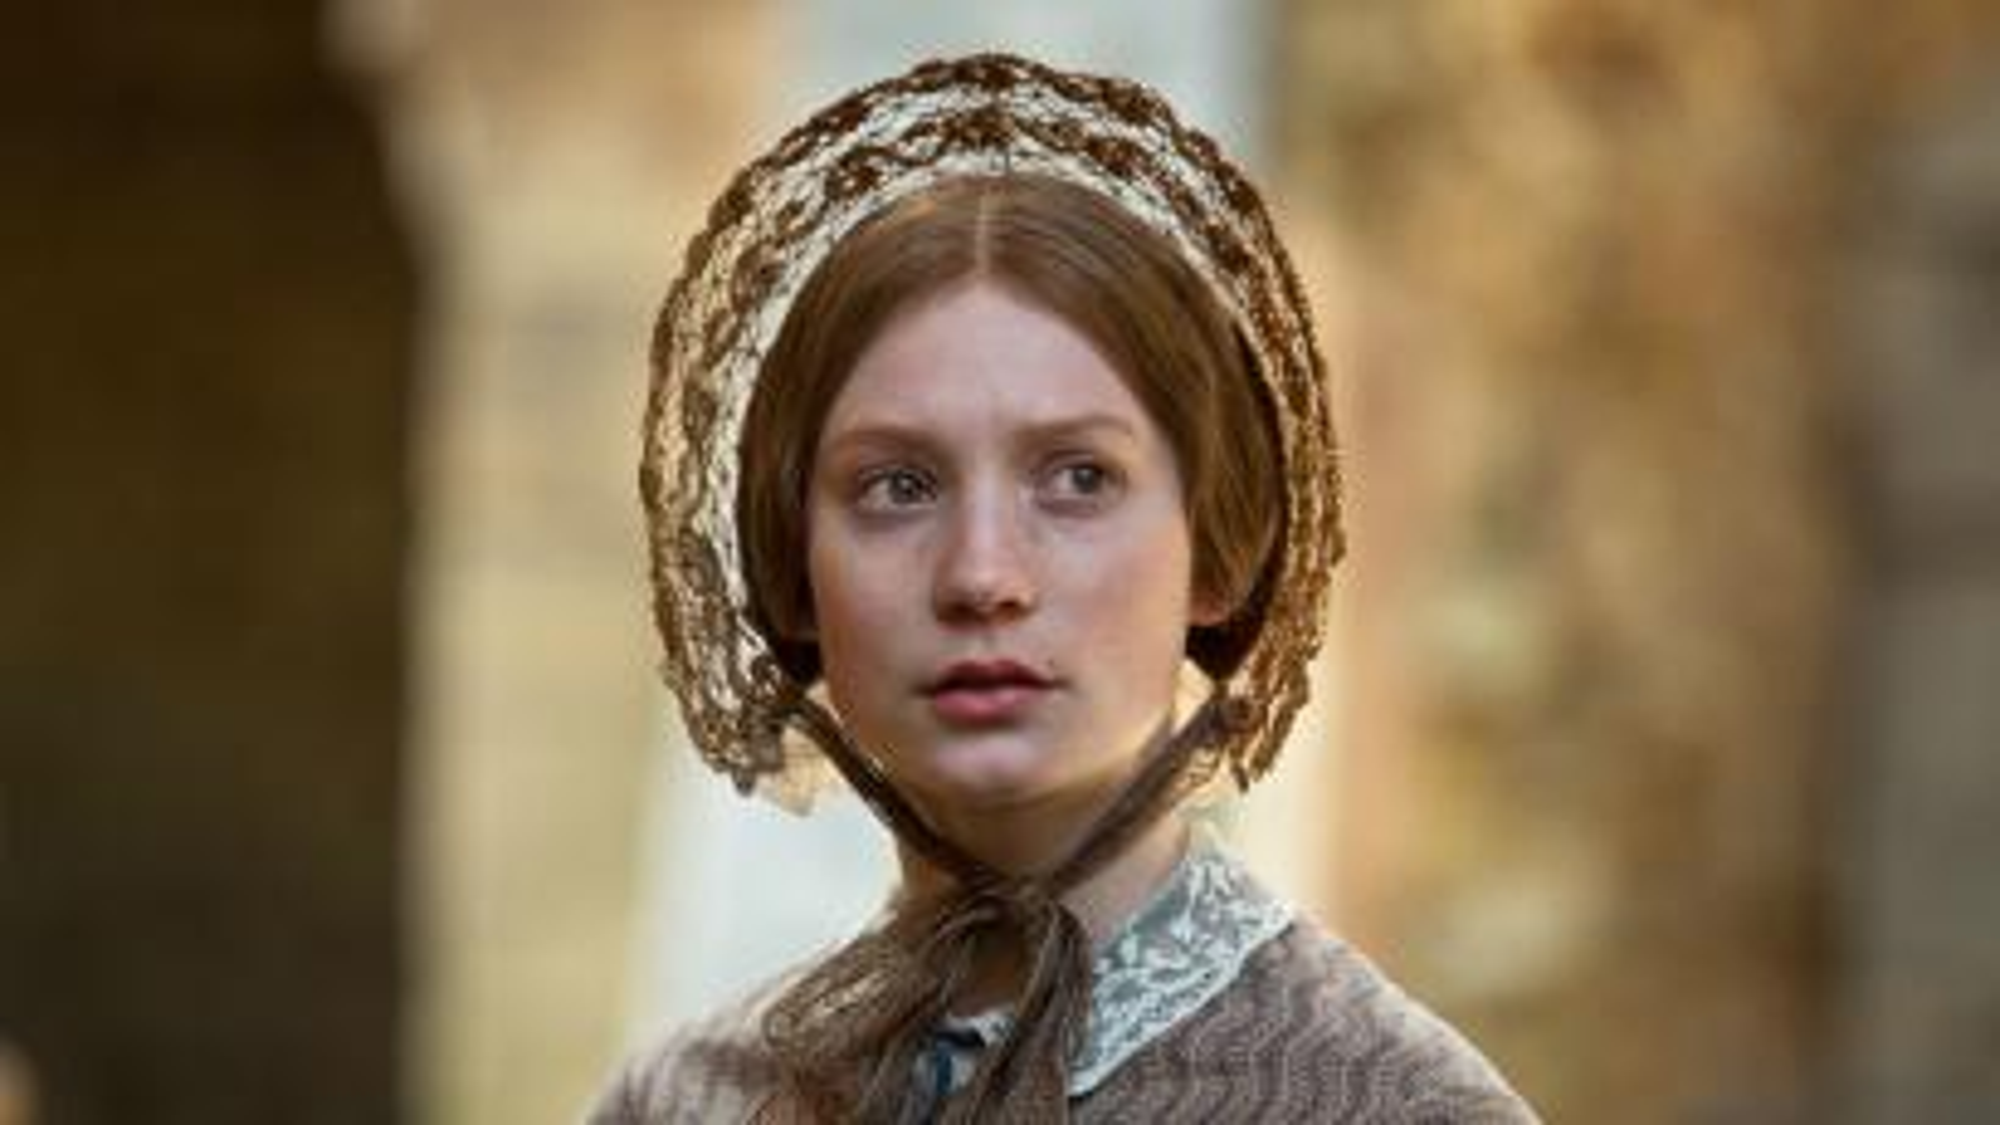 Mia Wasikowska as Jane Eyre in the 2011 movie adaptation of Charlotte Brontë's novel